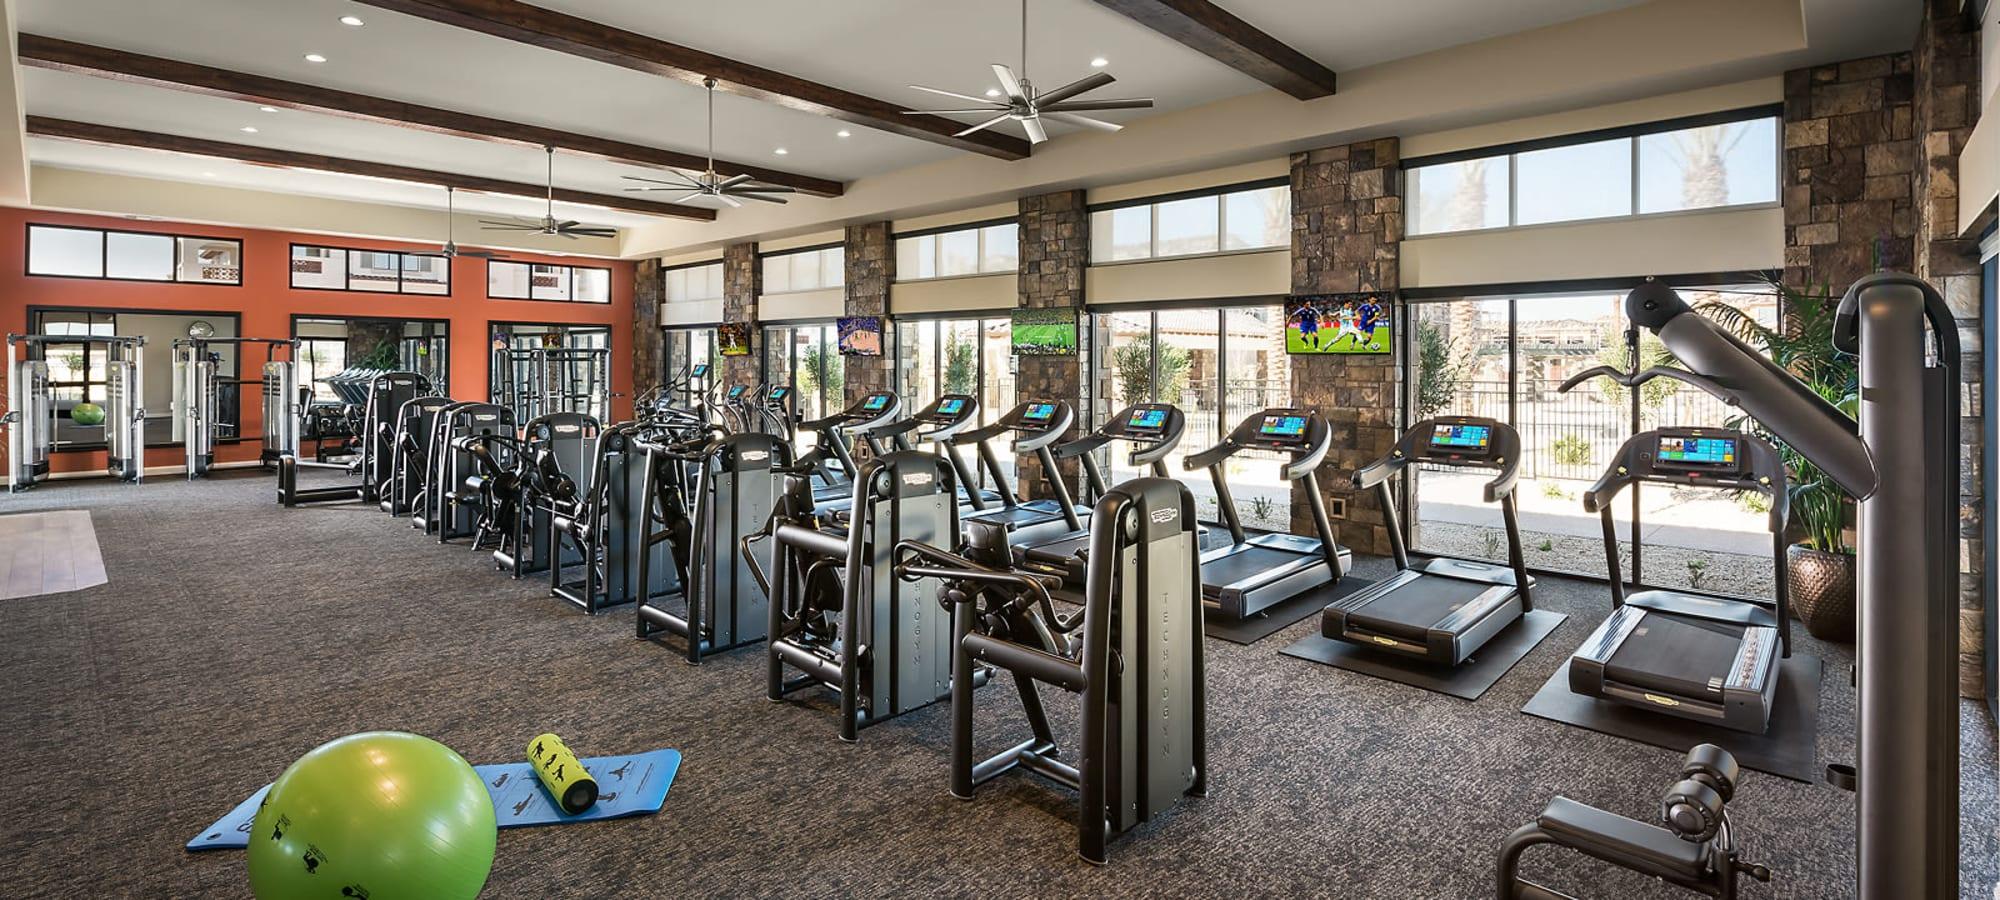 Fitness center at San Artes in Scottsdale, Arizona